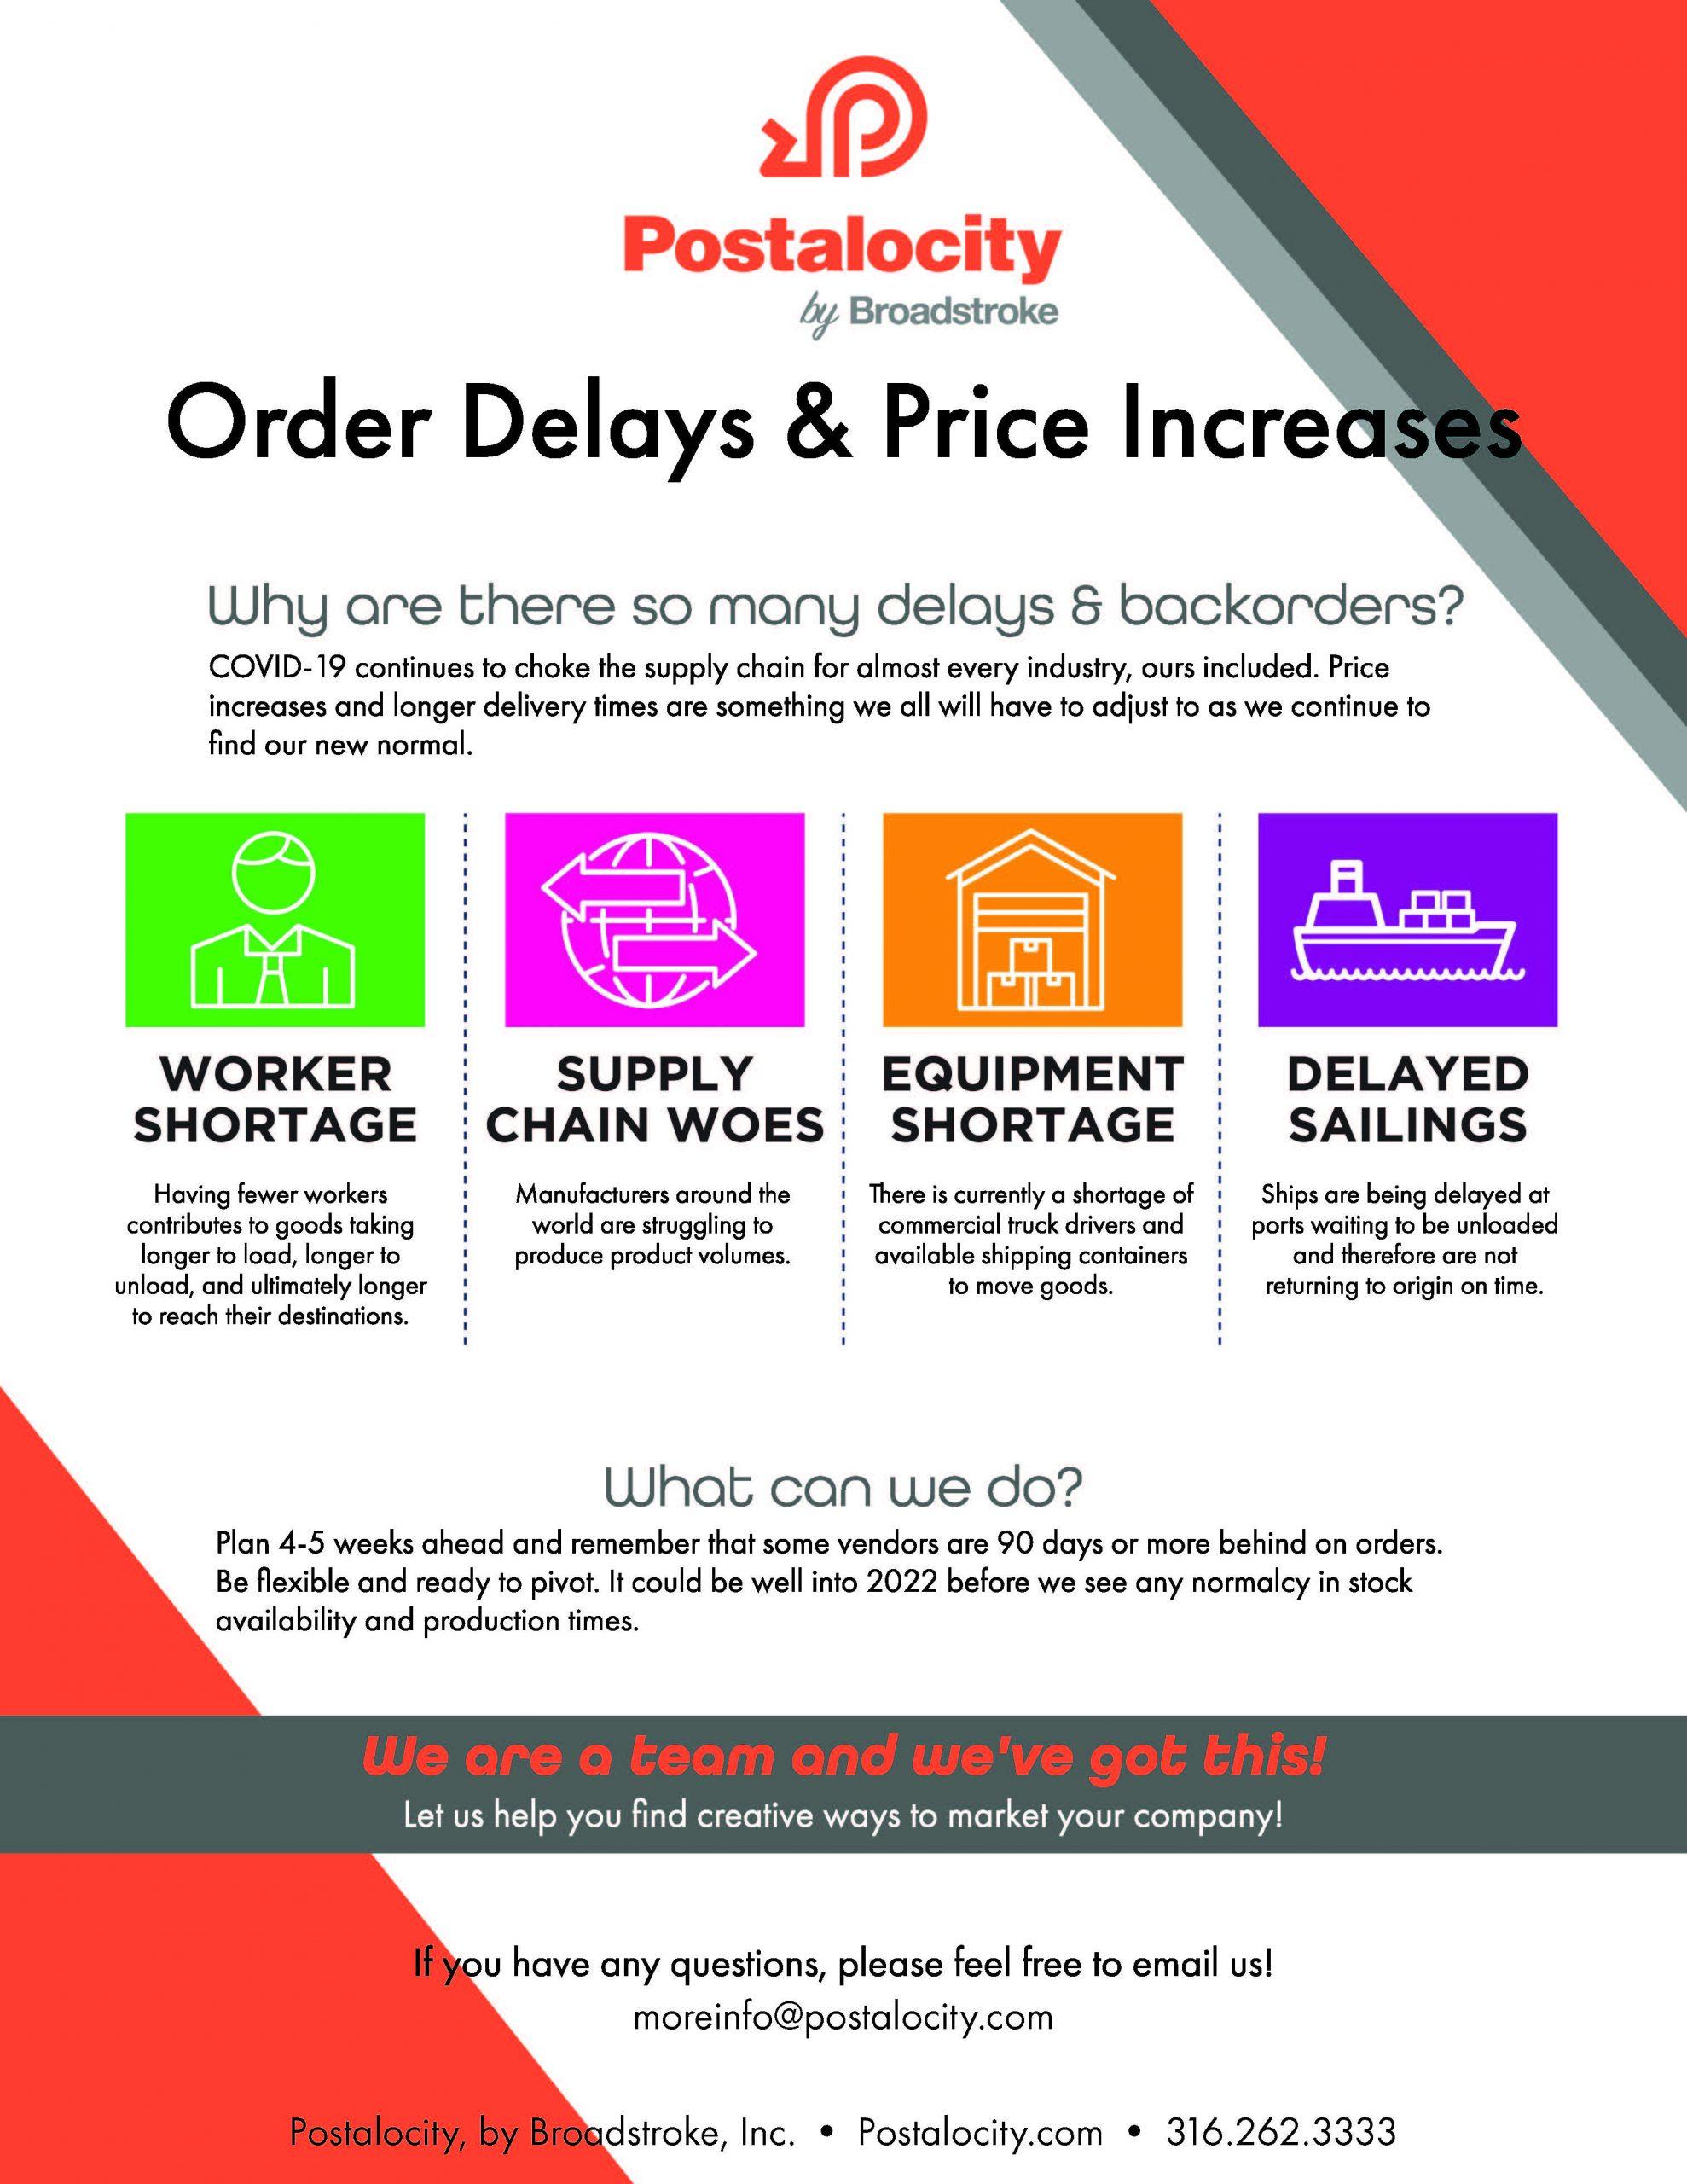 Order delays & Price Increases